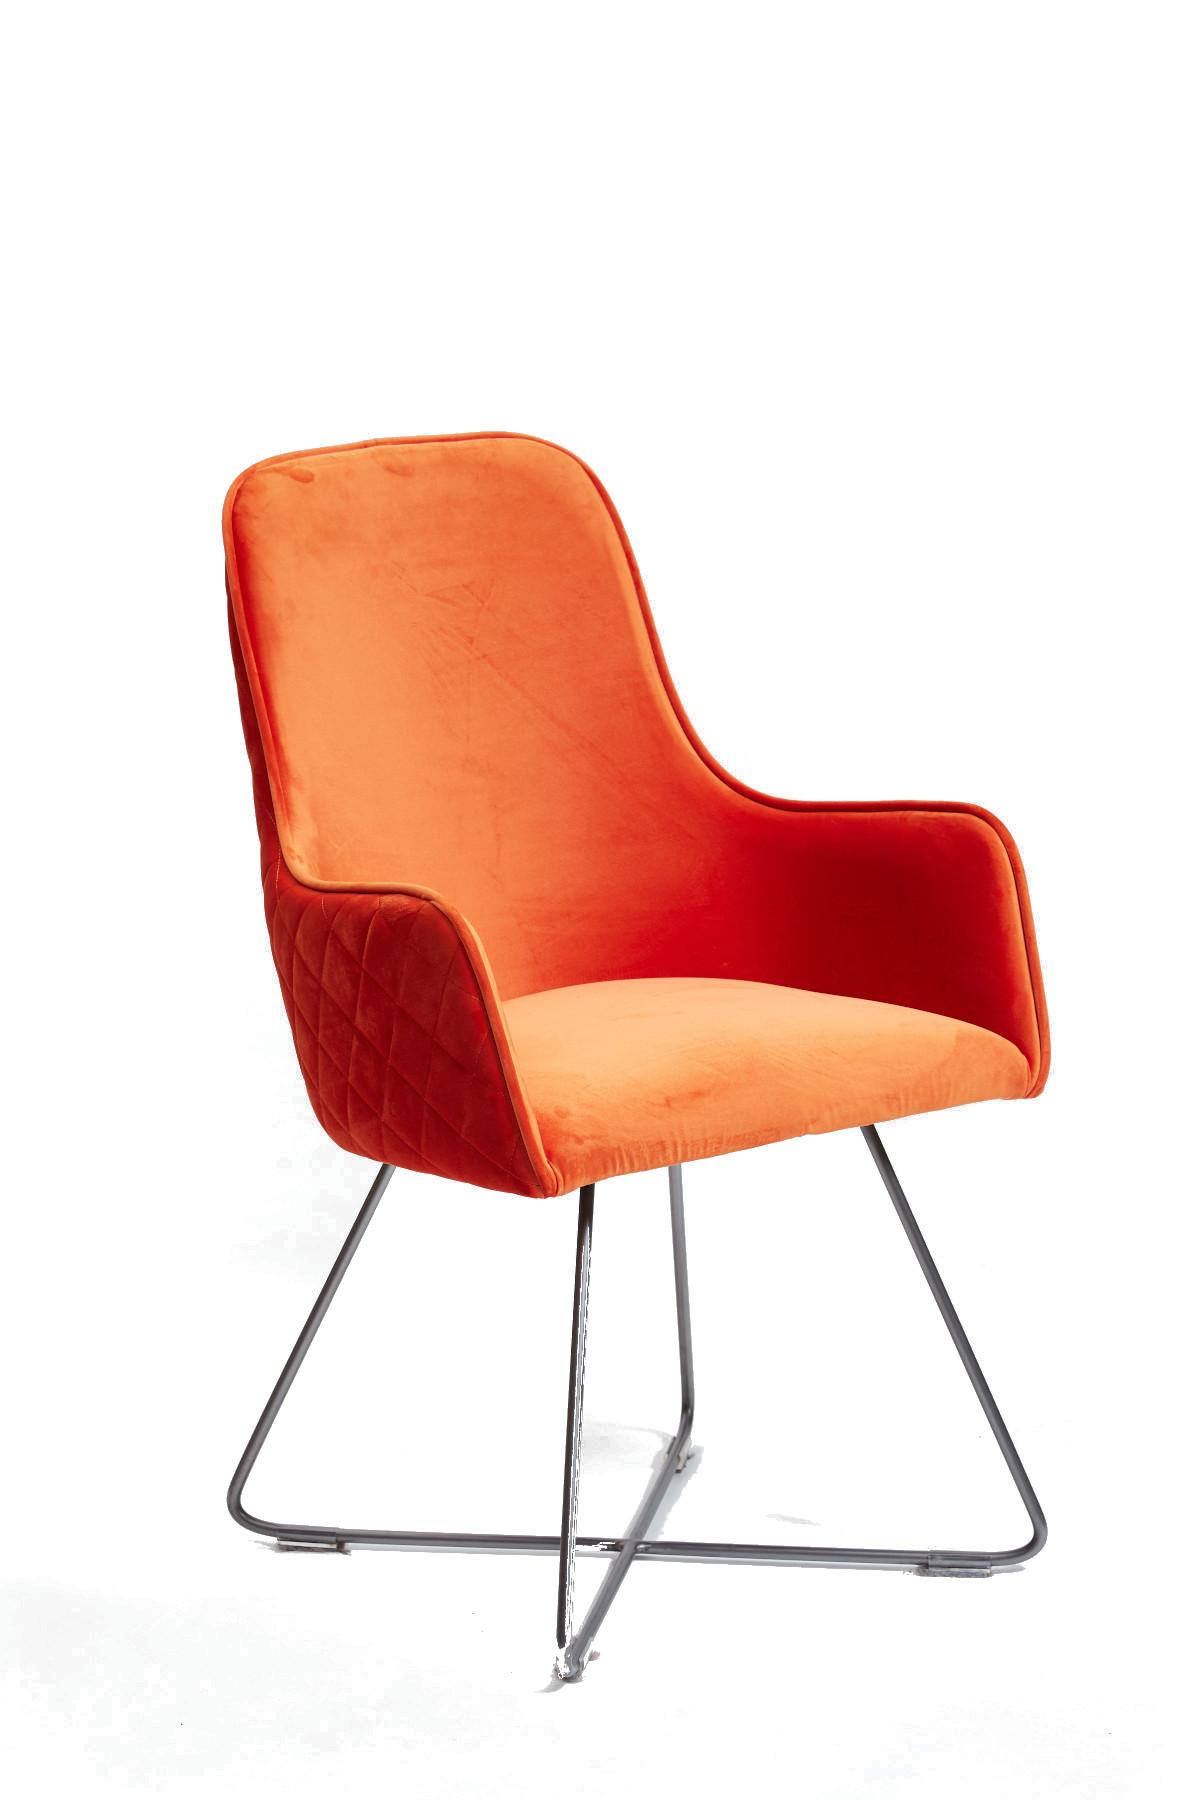 Utah Dining Chair - Pumpkin